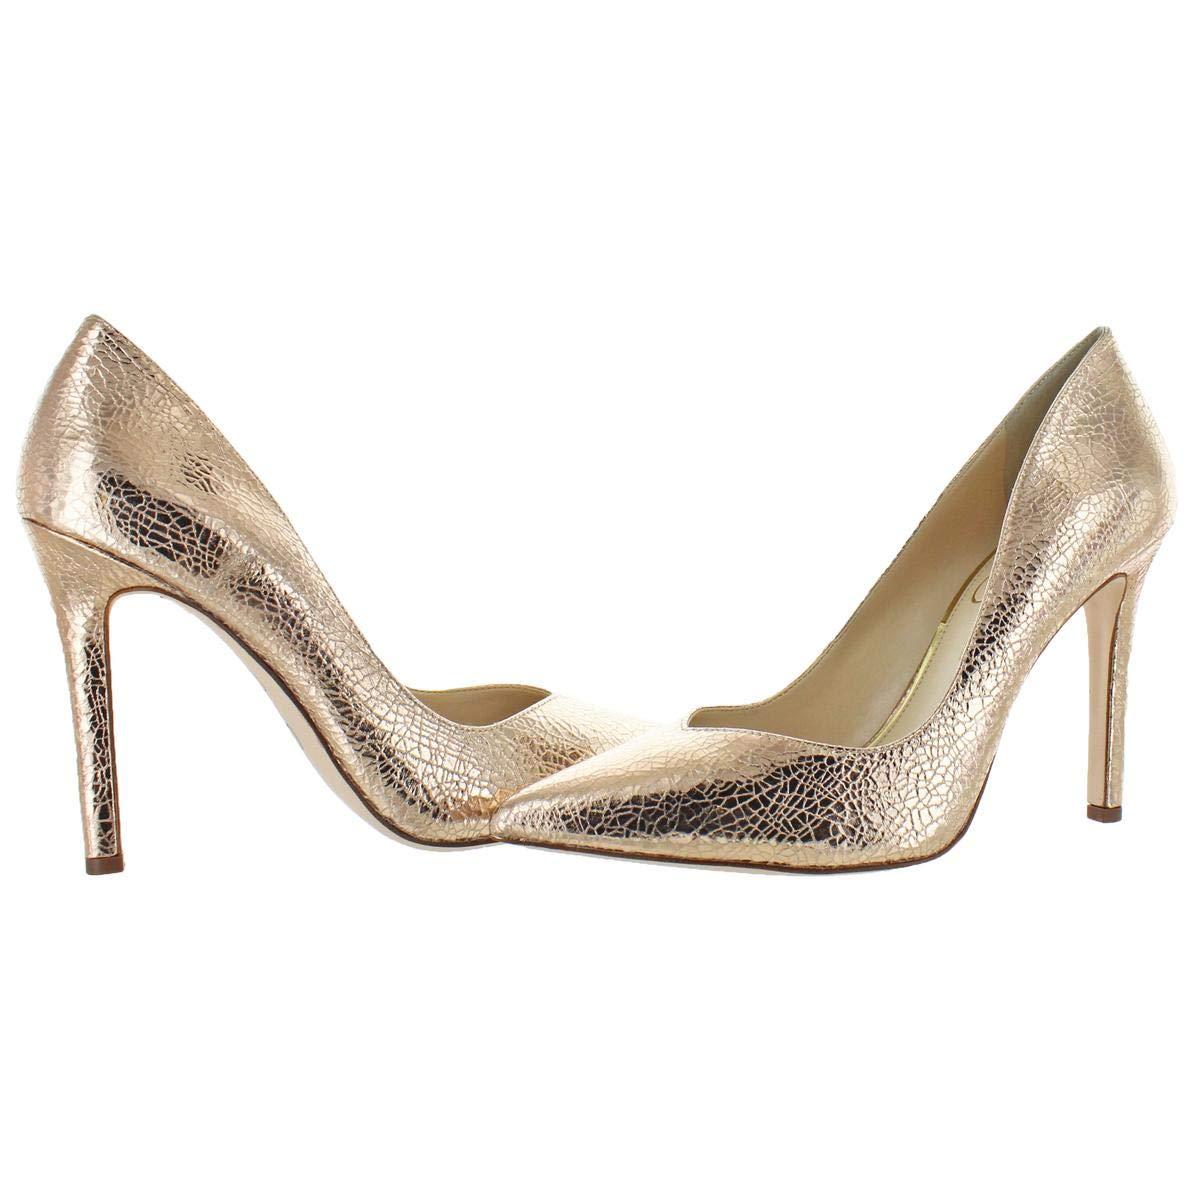 3faf4067cd Amazon.com | Jessica Simpson Women's Cylvie Metallic V-Cut Pumps Heels Shoes  Pink Size 8 | Pumps